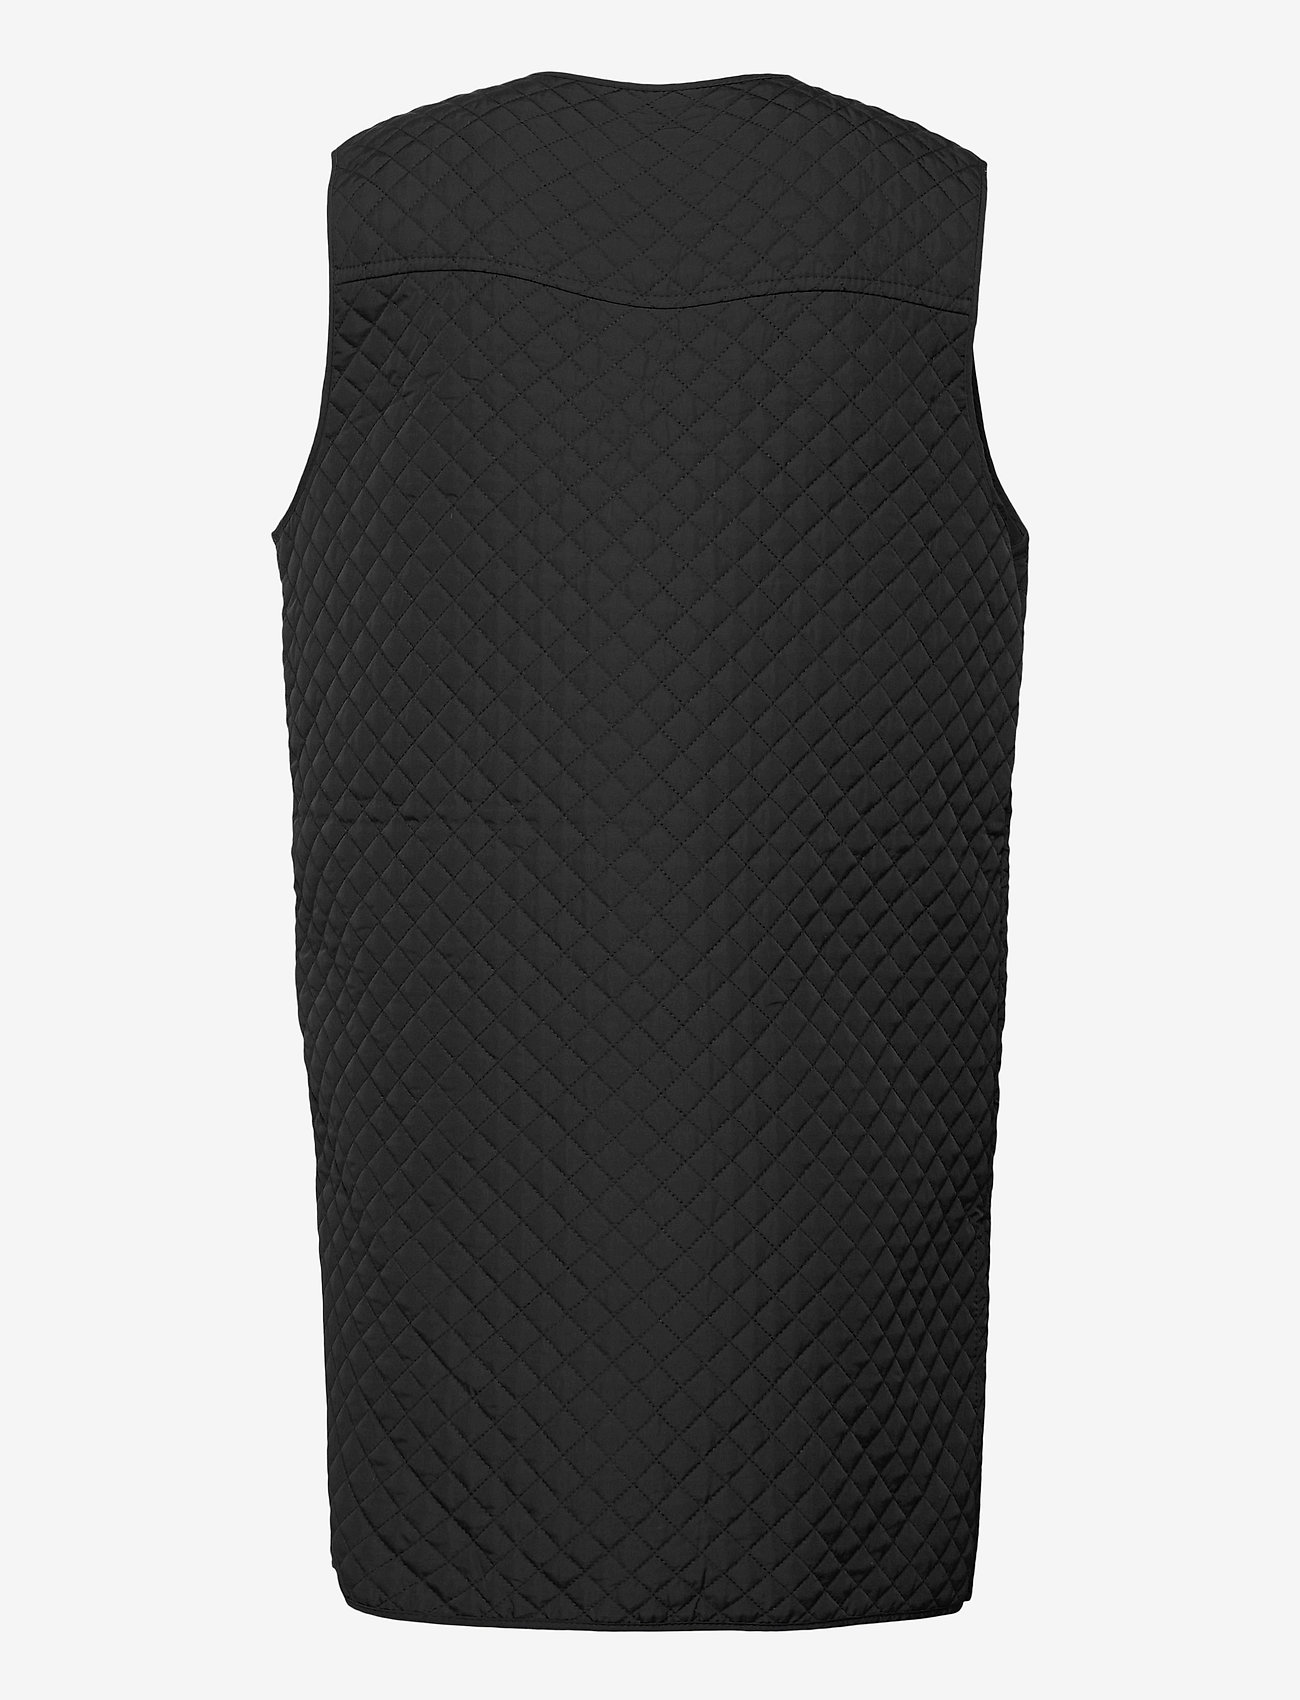 Levete Room - LR-MAGNOLIA - puffer vests - l999 - black - 1